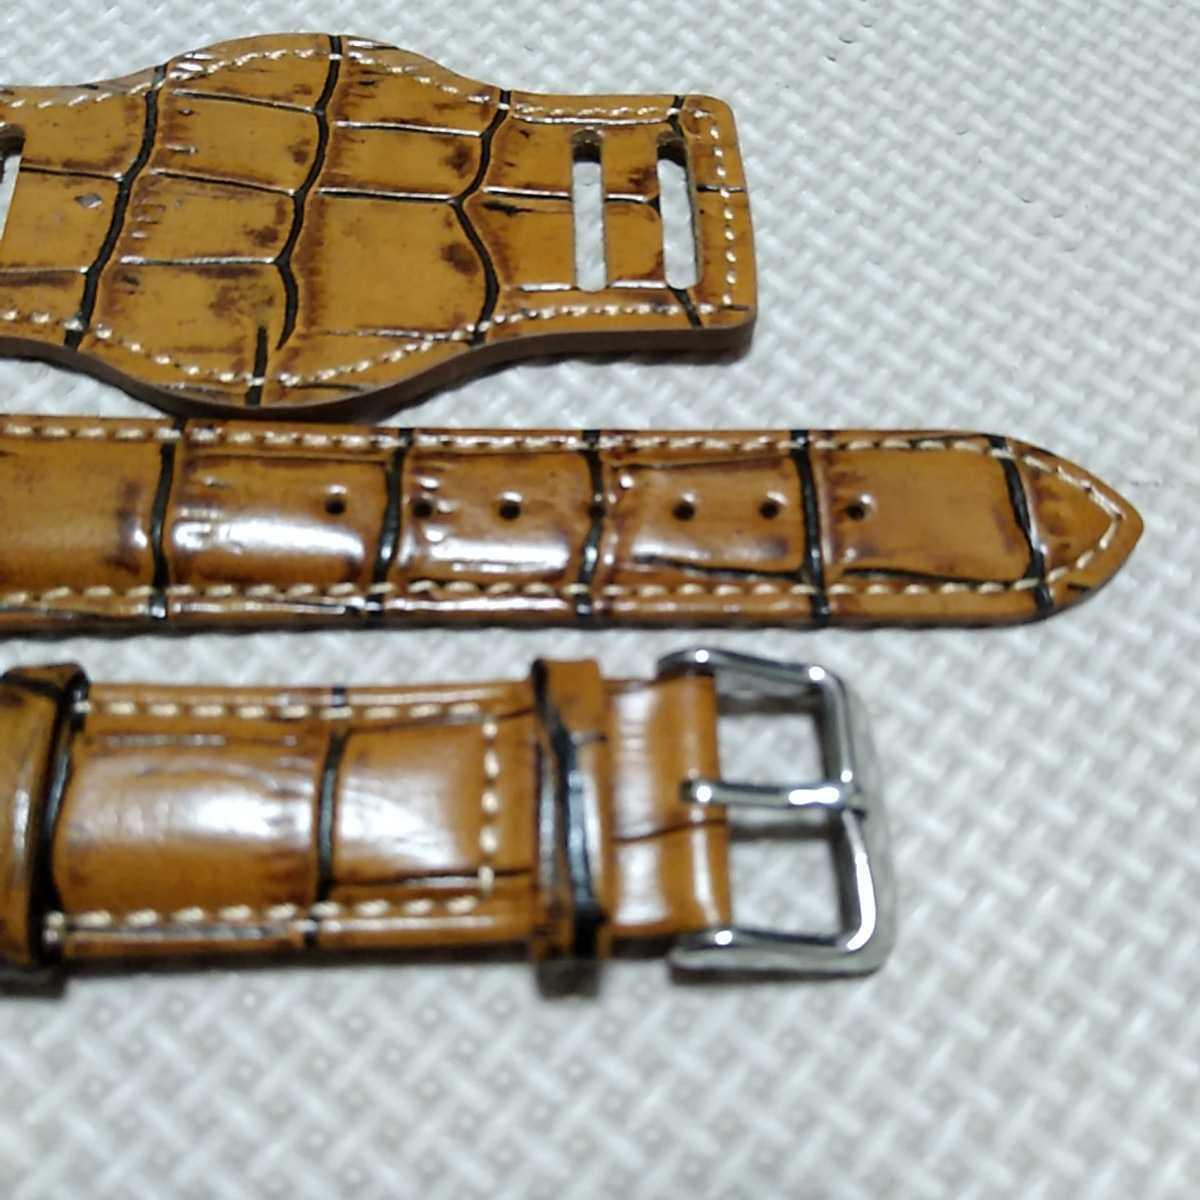 No55 ブンド BUND 本革レザーベルト 腕時計ベルト 交換用ストラップ ブラウン クロコ型押し 20mm 未使用 高品質 ドイツパイロット 空軍_画像3